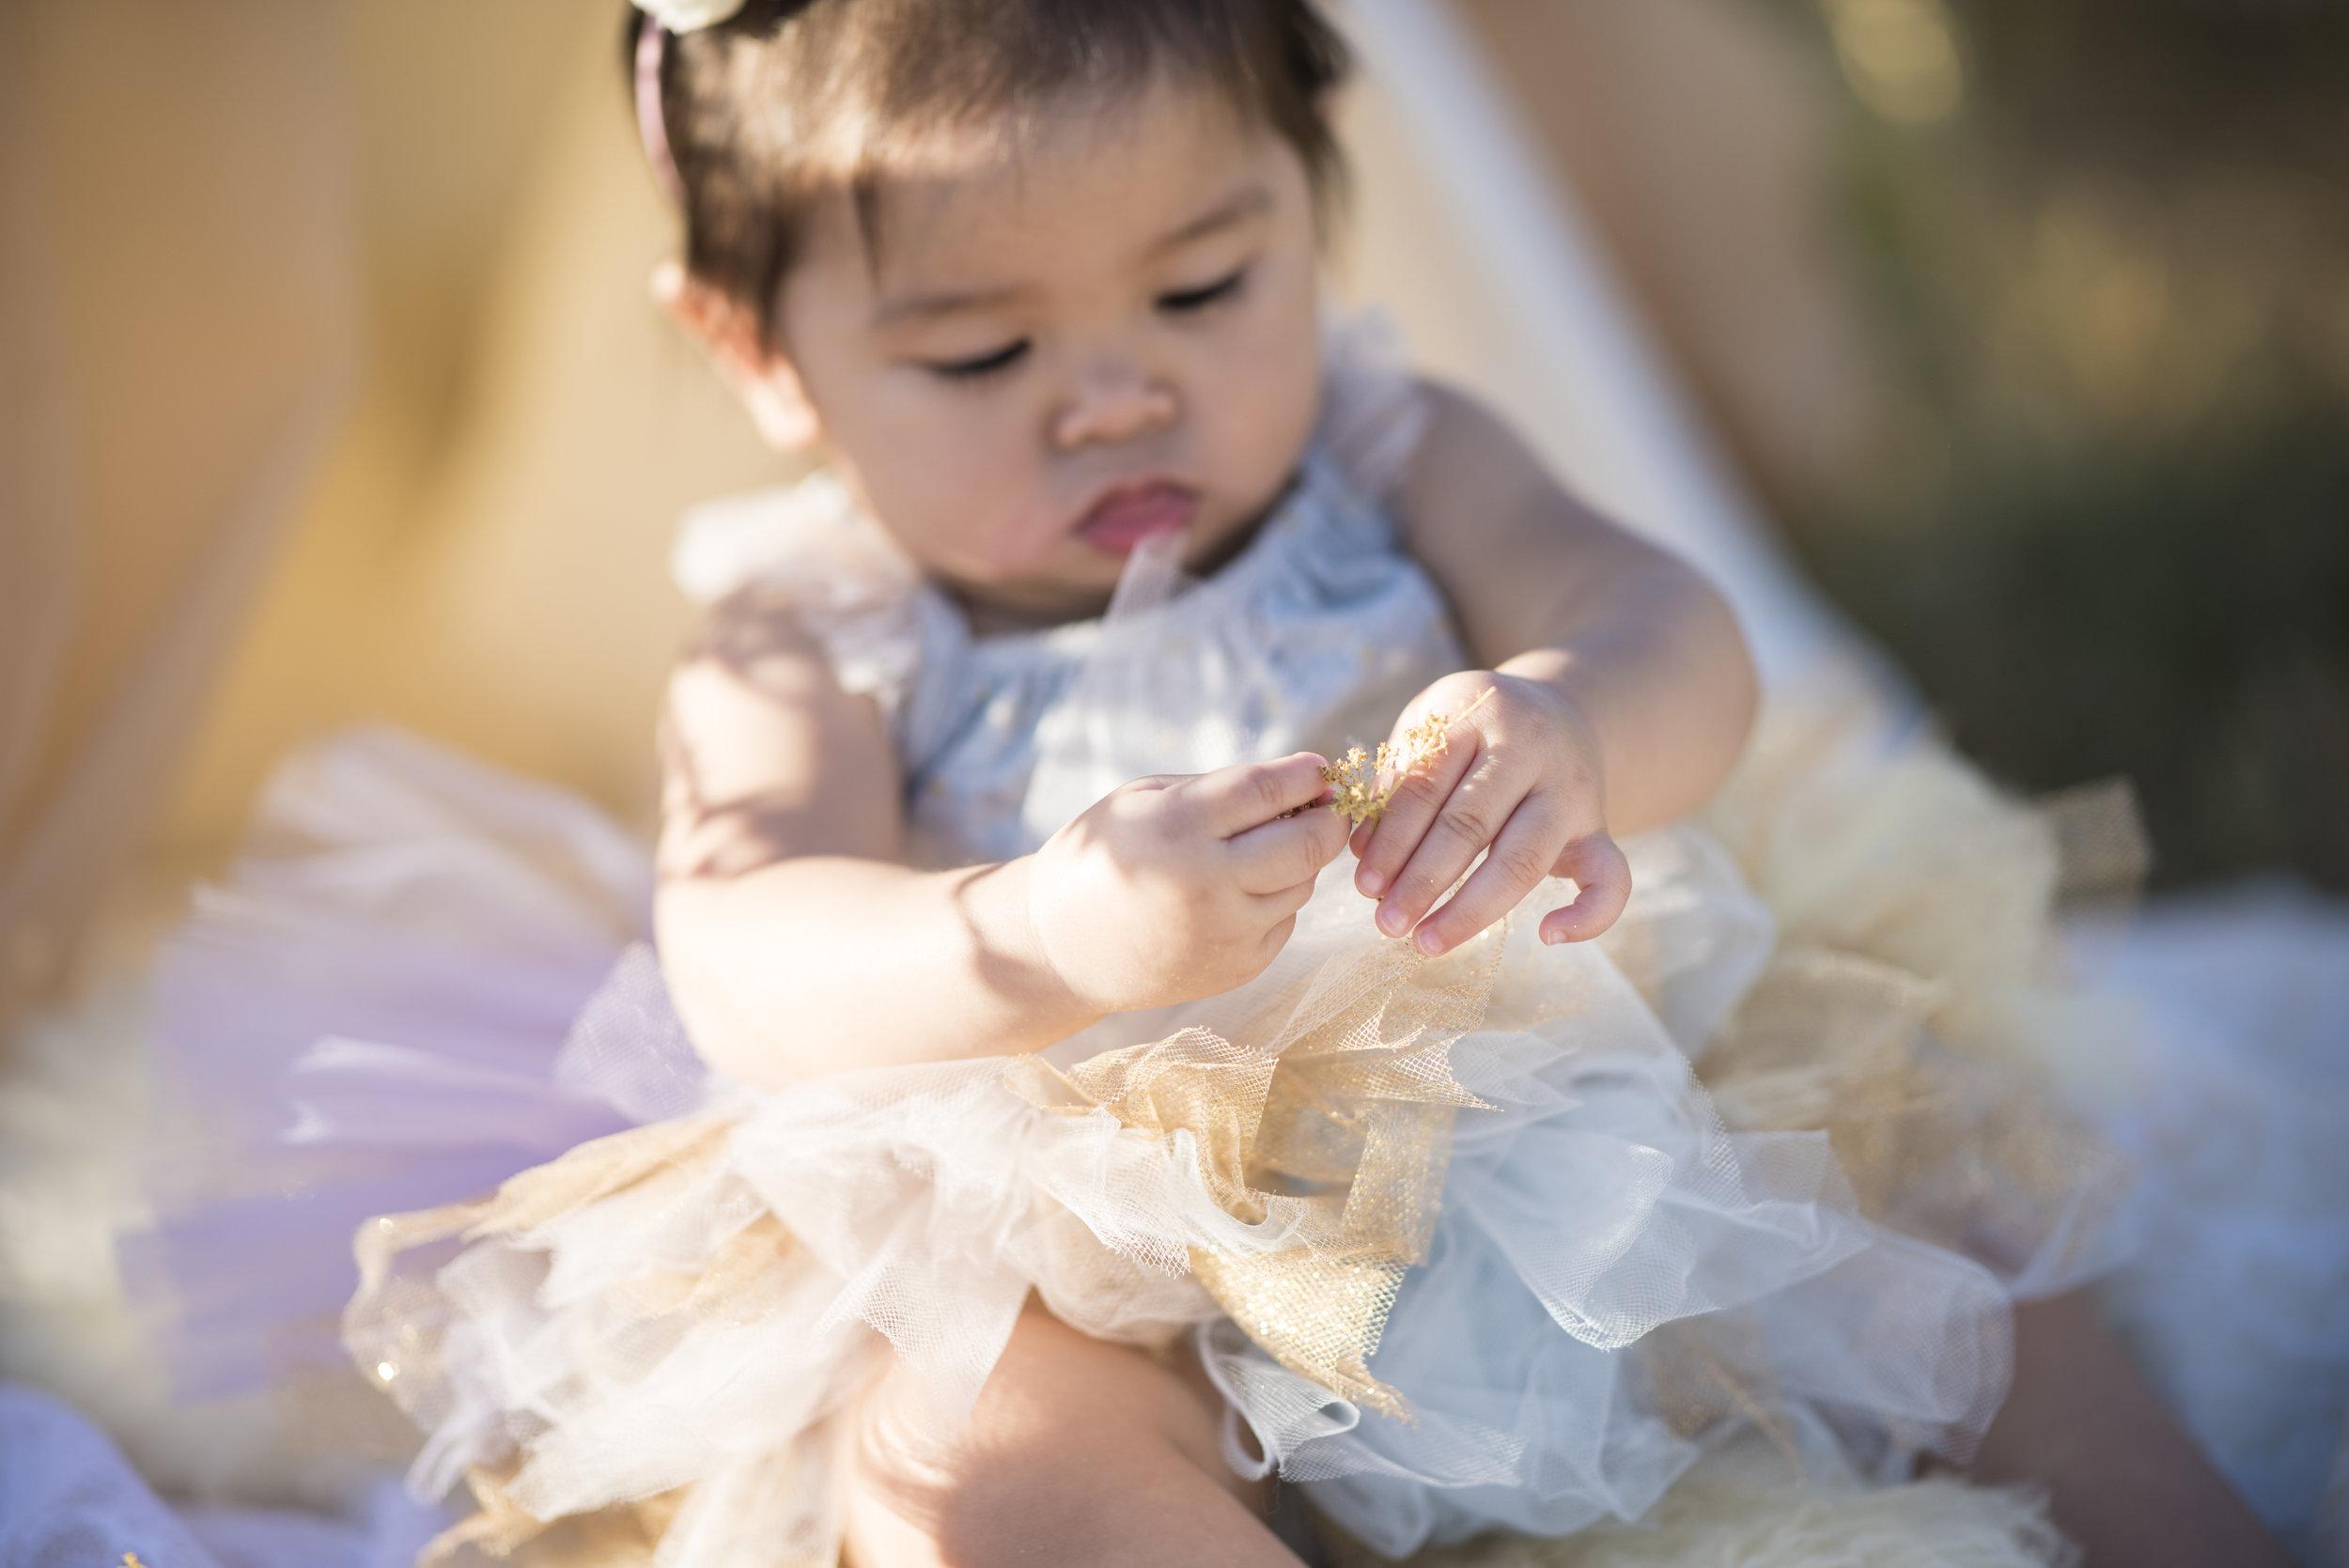 Lets_Spread_Beauty_Photography_Chloe_First_Birthday20150909_0867.jpg